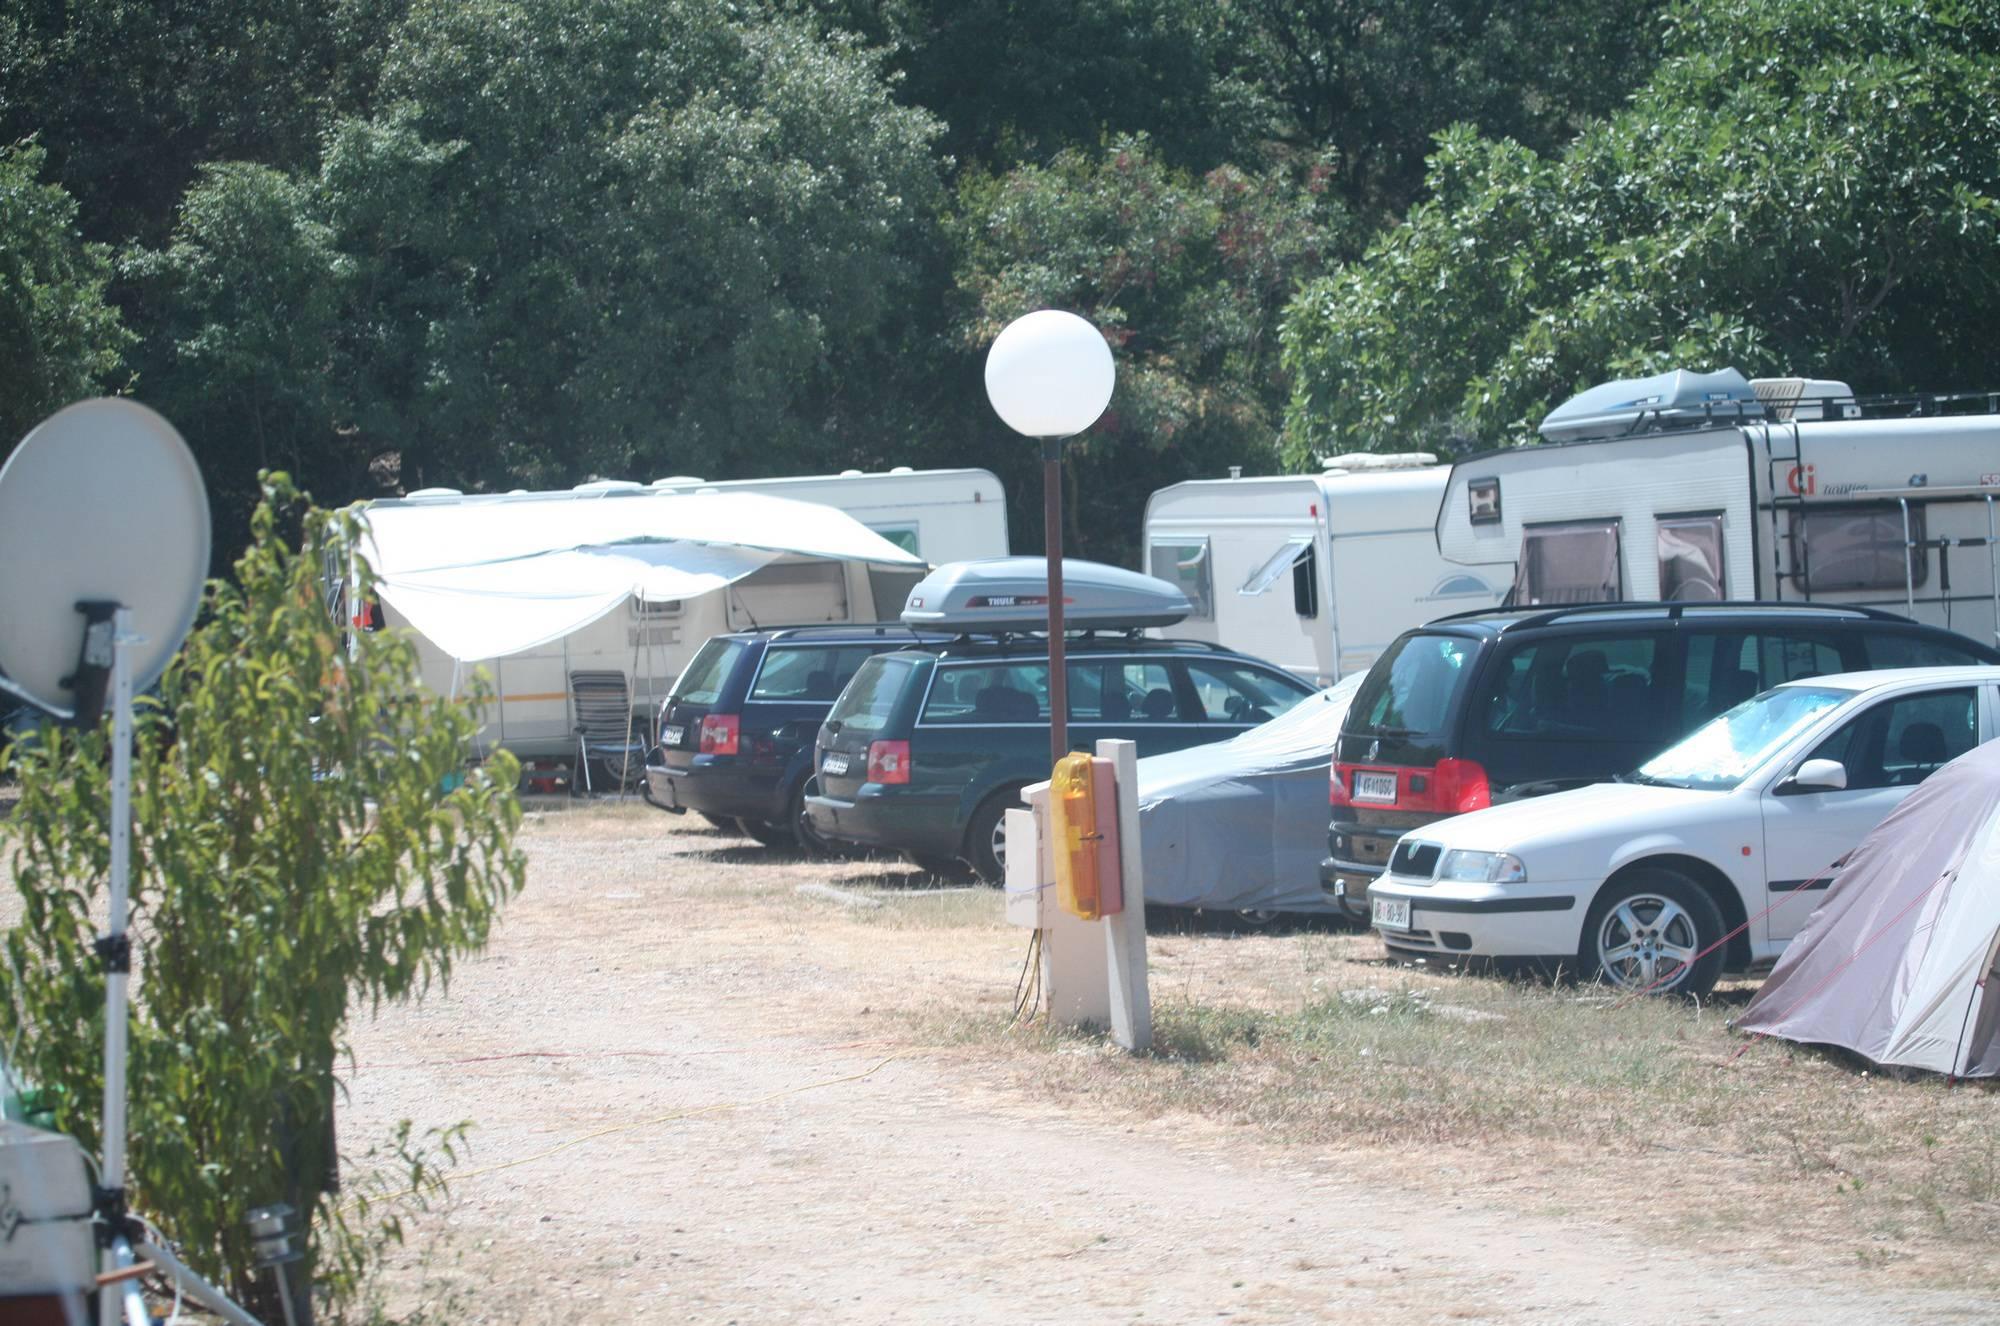 Nudist Photos Bares Camping Scenery - 1